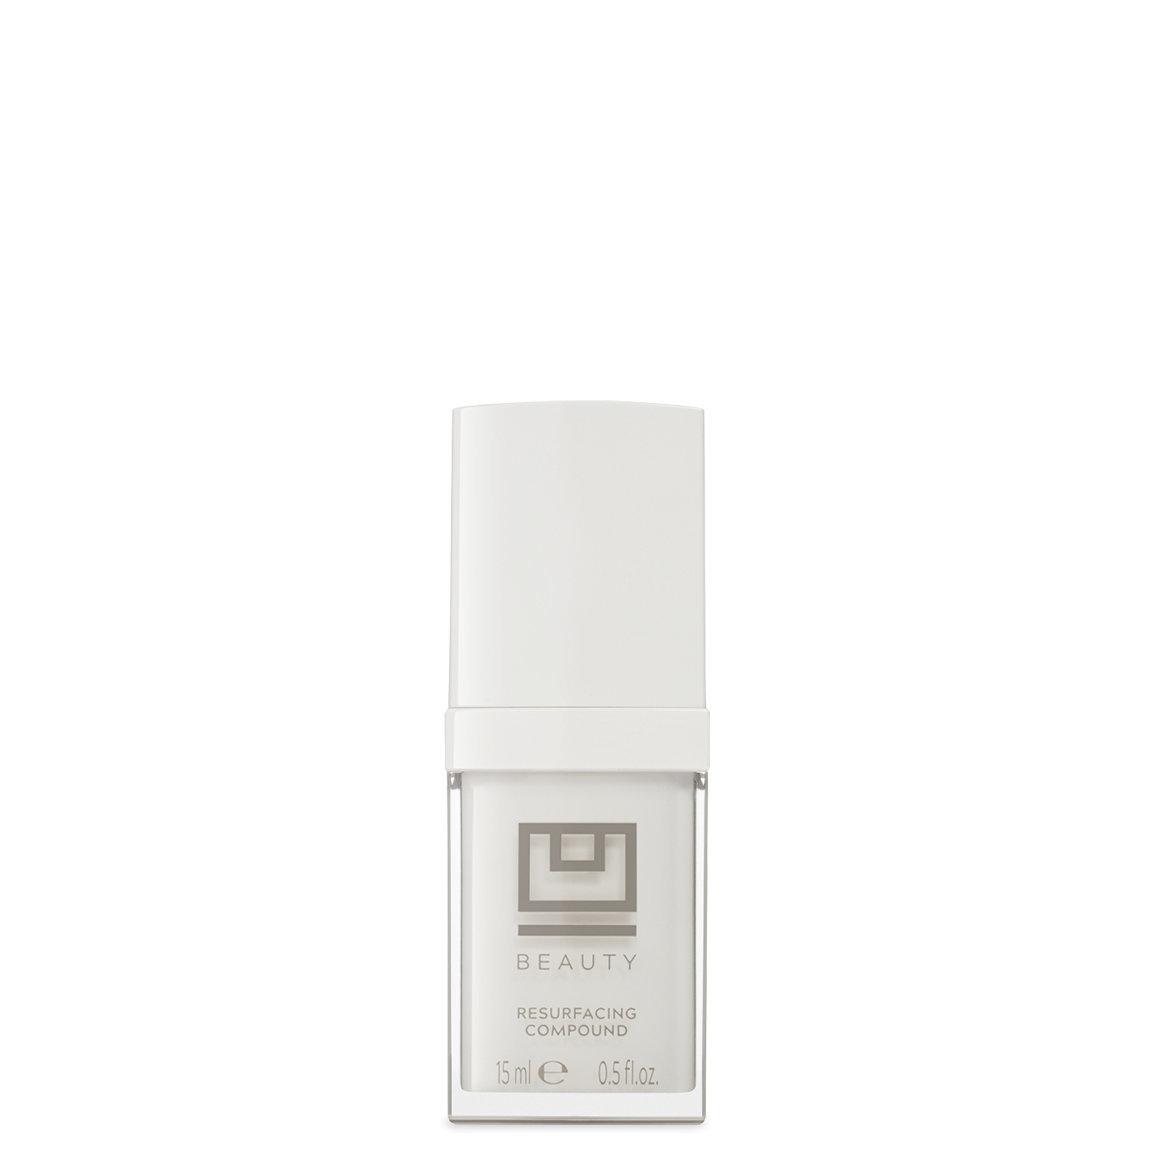 U Beauty Resurfacing Compound 15 ml alternative view 1 - product swatch.